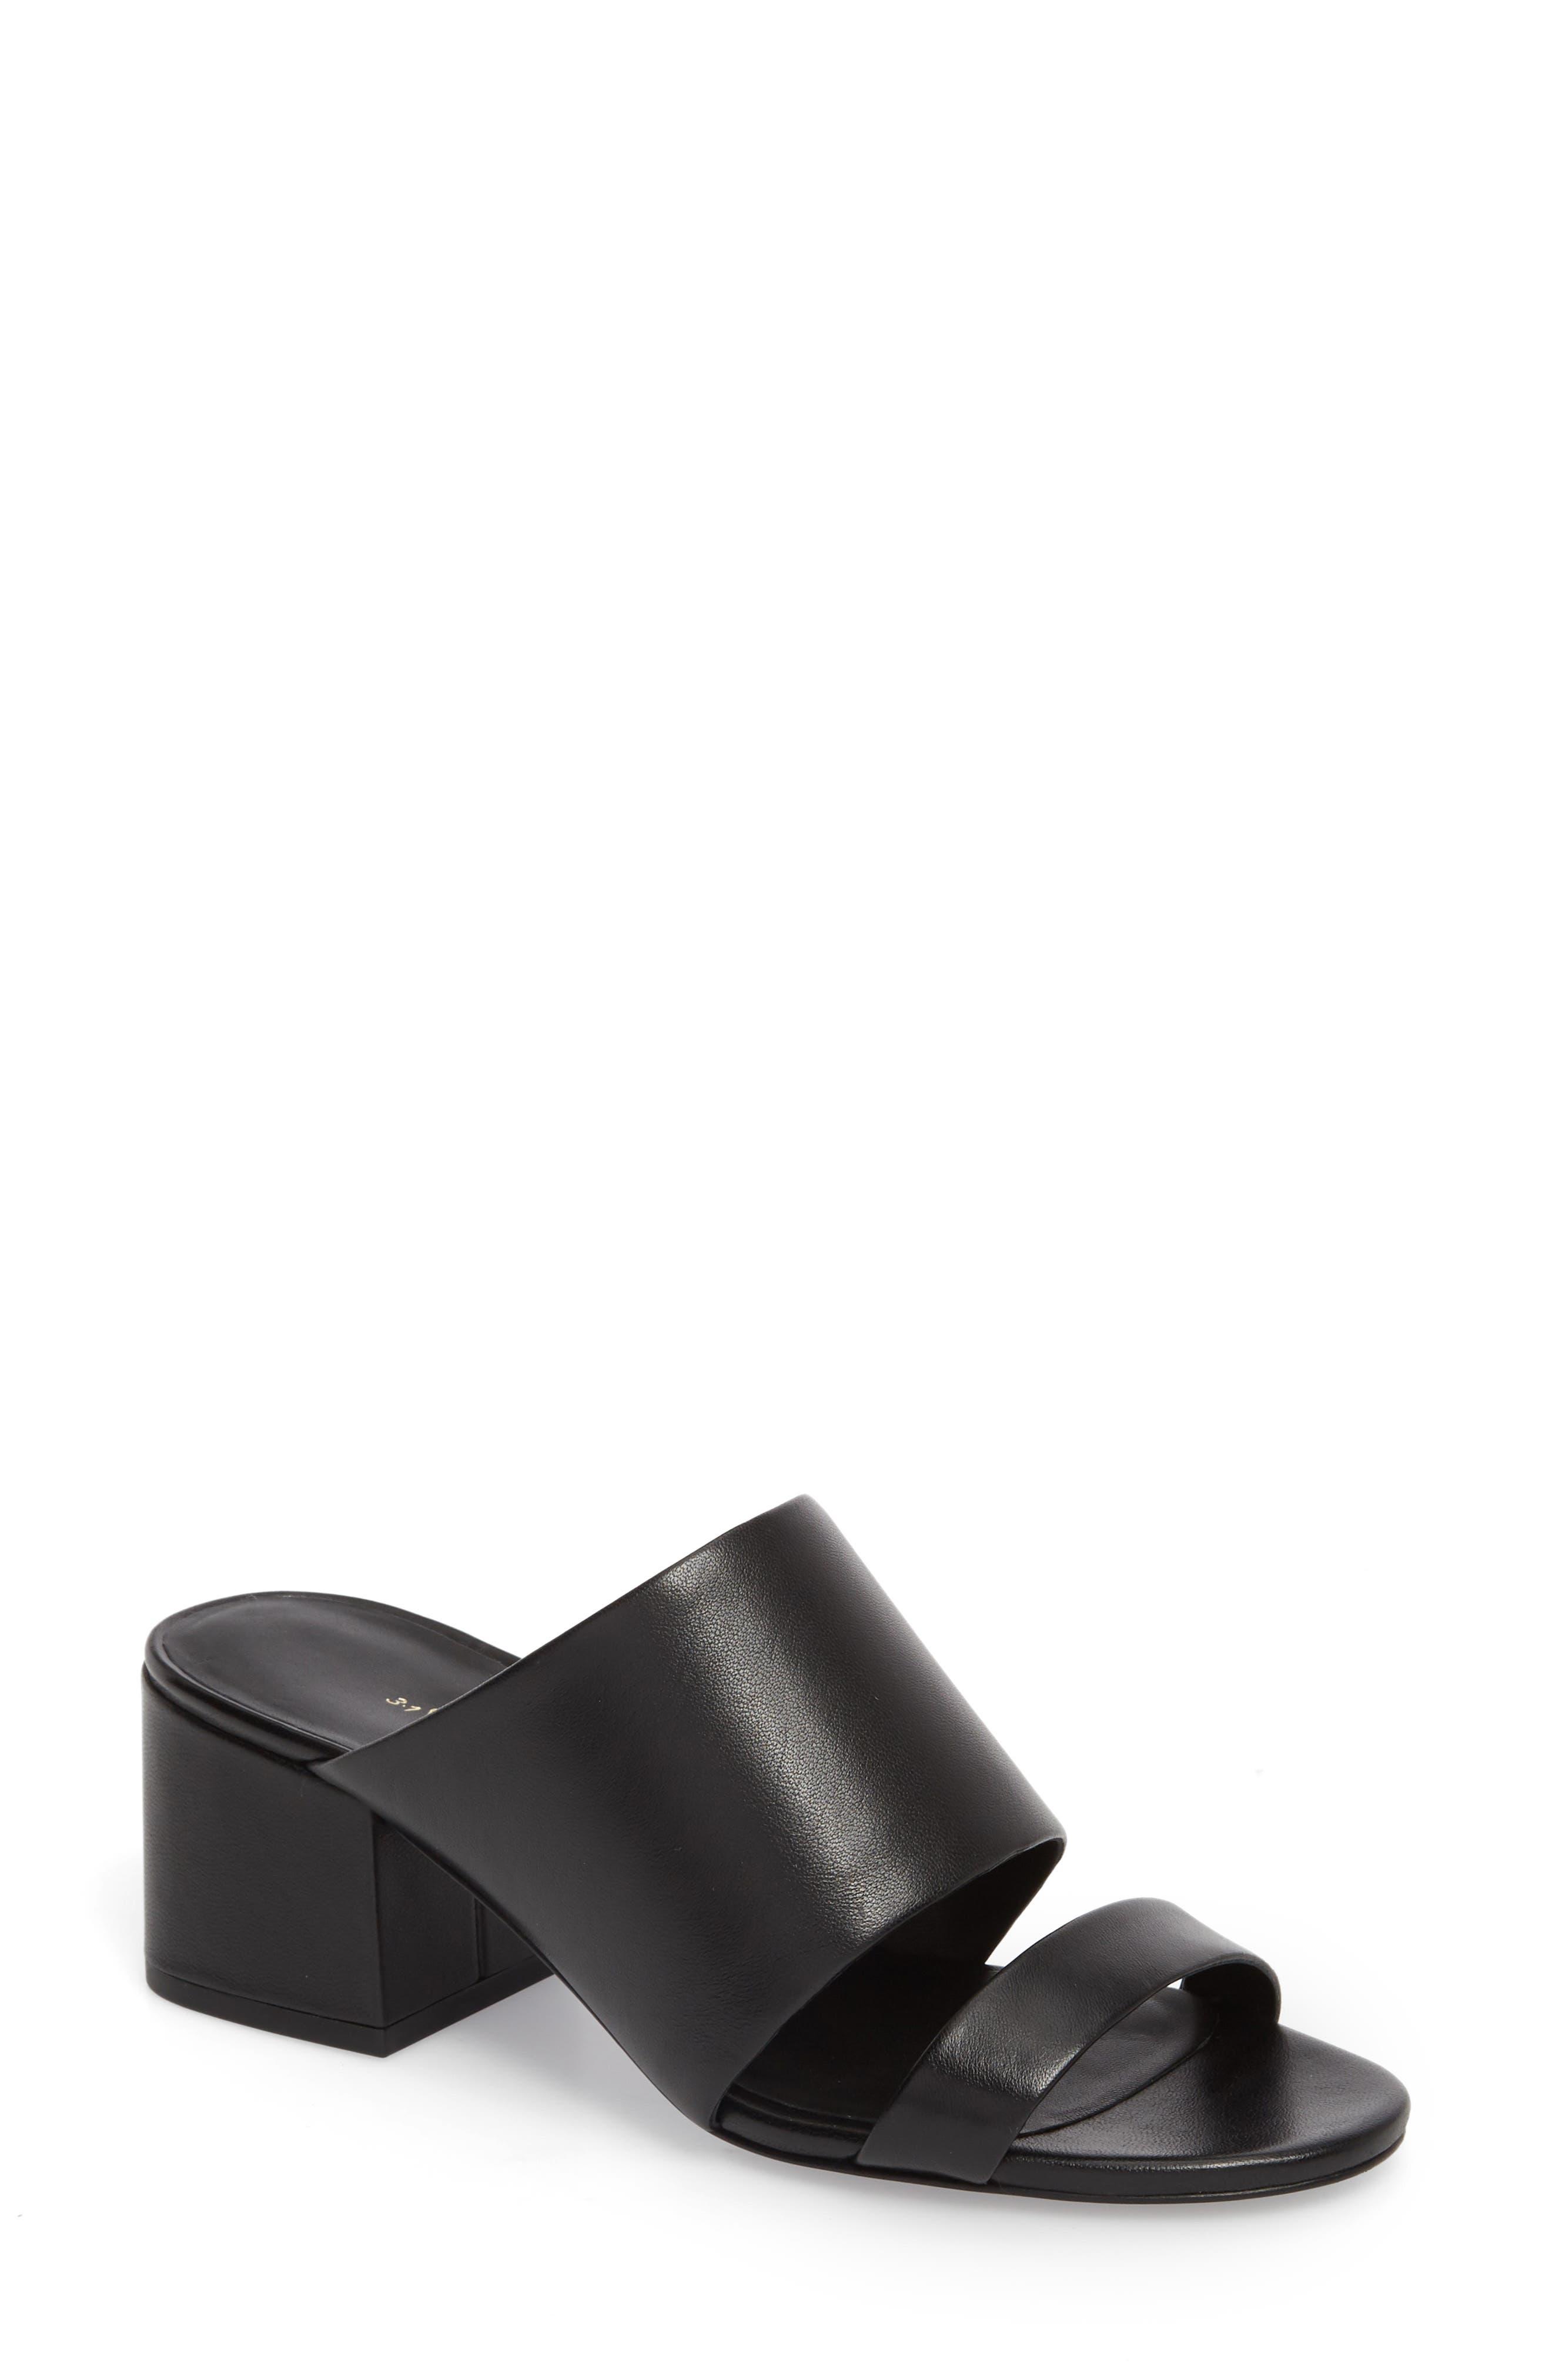 3.1 Phillip Lim Cube Strappy Slide Sandal, Black